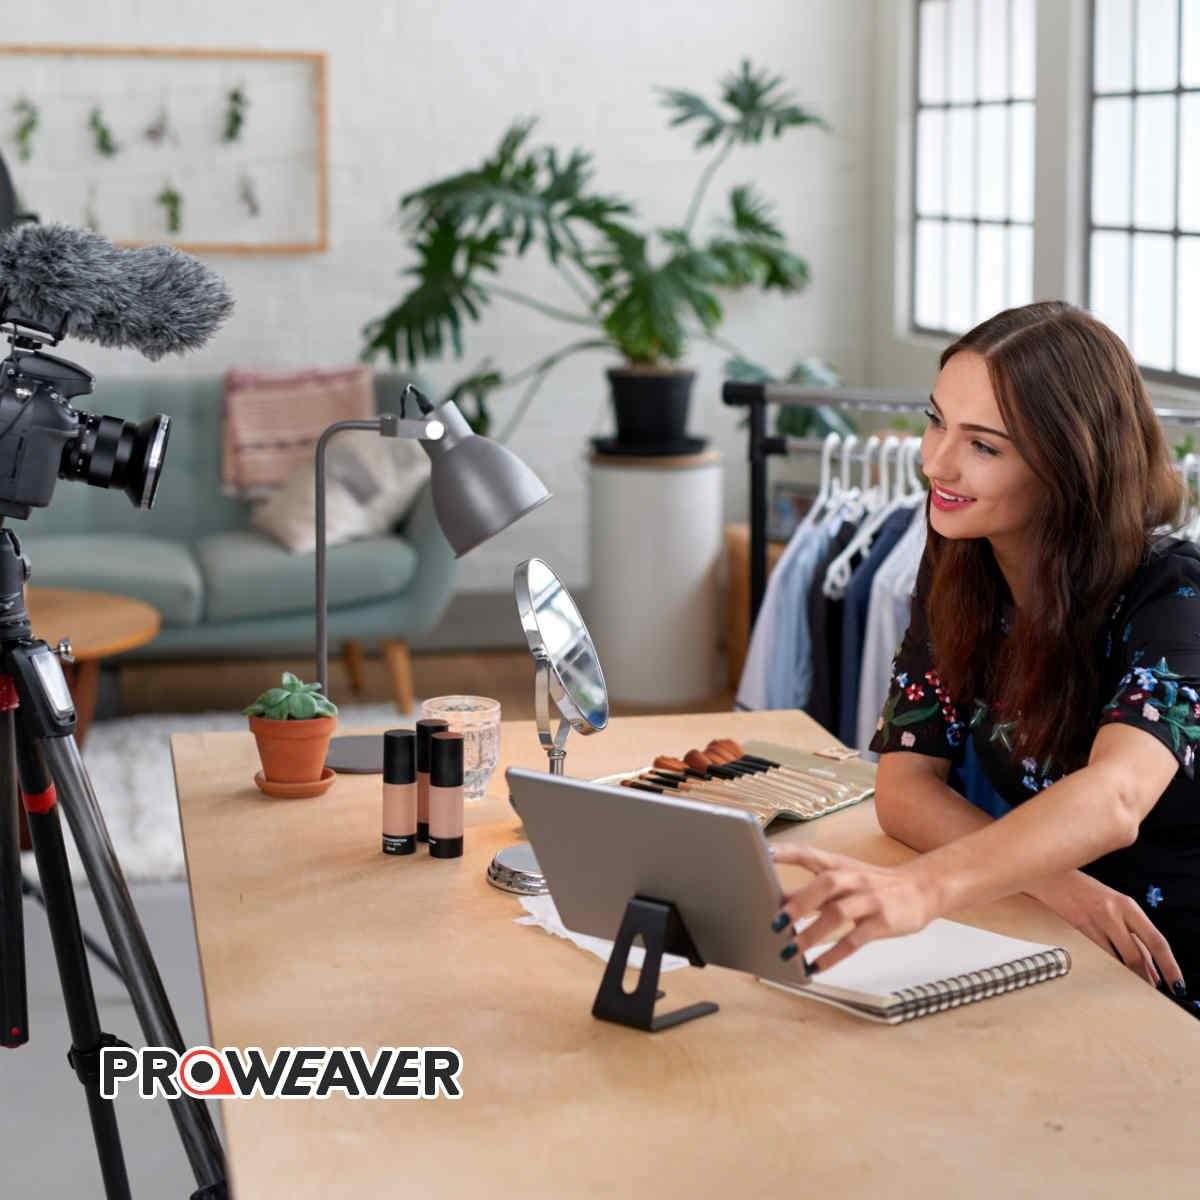 influencer-filming-for-endorsement